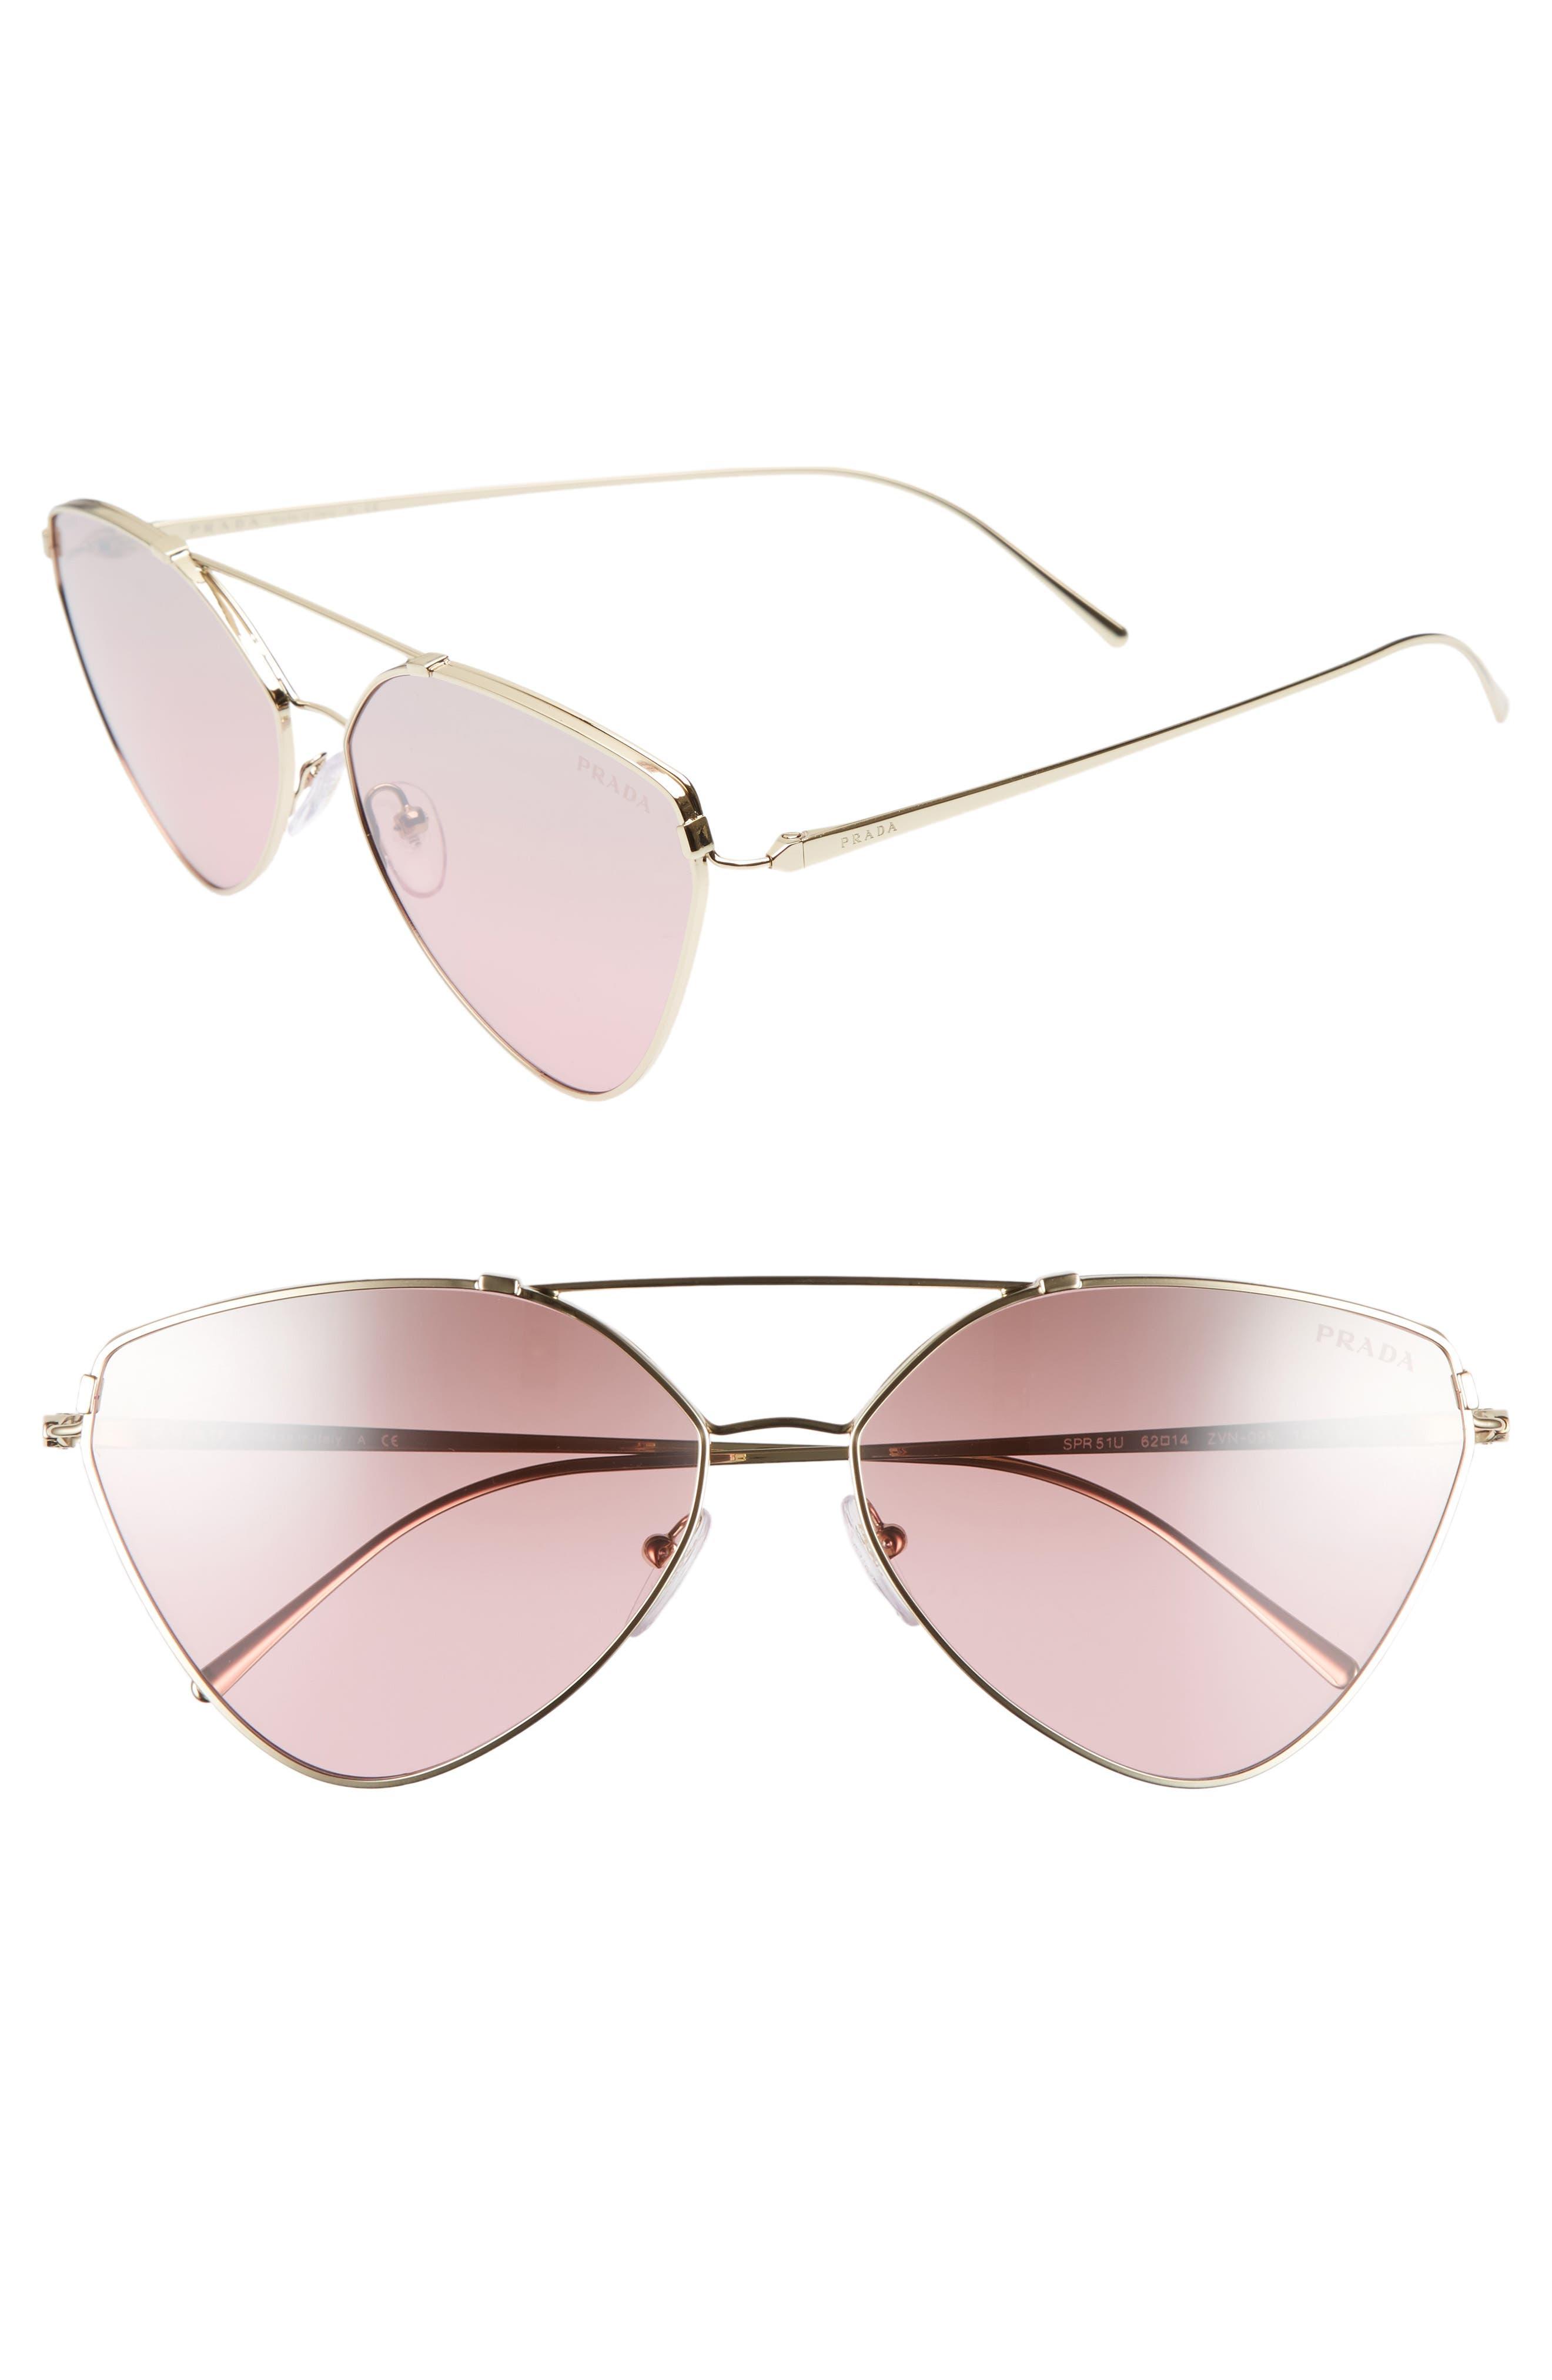 62mm Gradient Aviator Sunglasses,                             Main thumbnail 1, color,                             Pale Gold